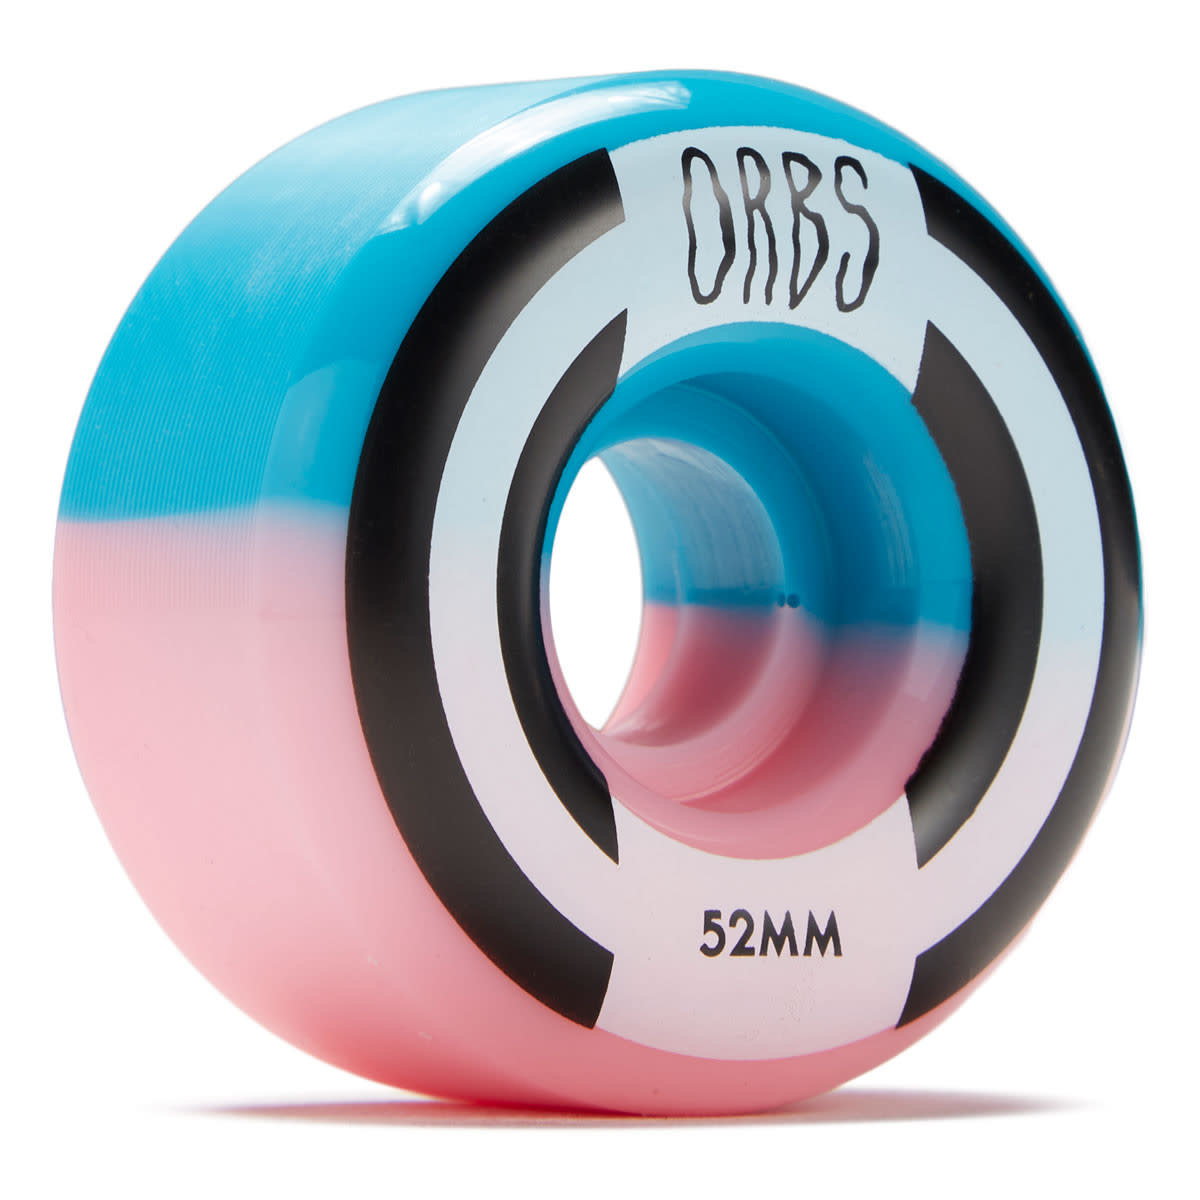 Orbs WHEELS-ORBS APPARITIONS SPLIT PINK/BLUE (52)